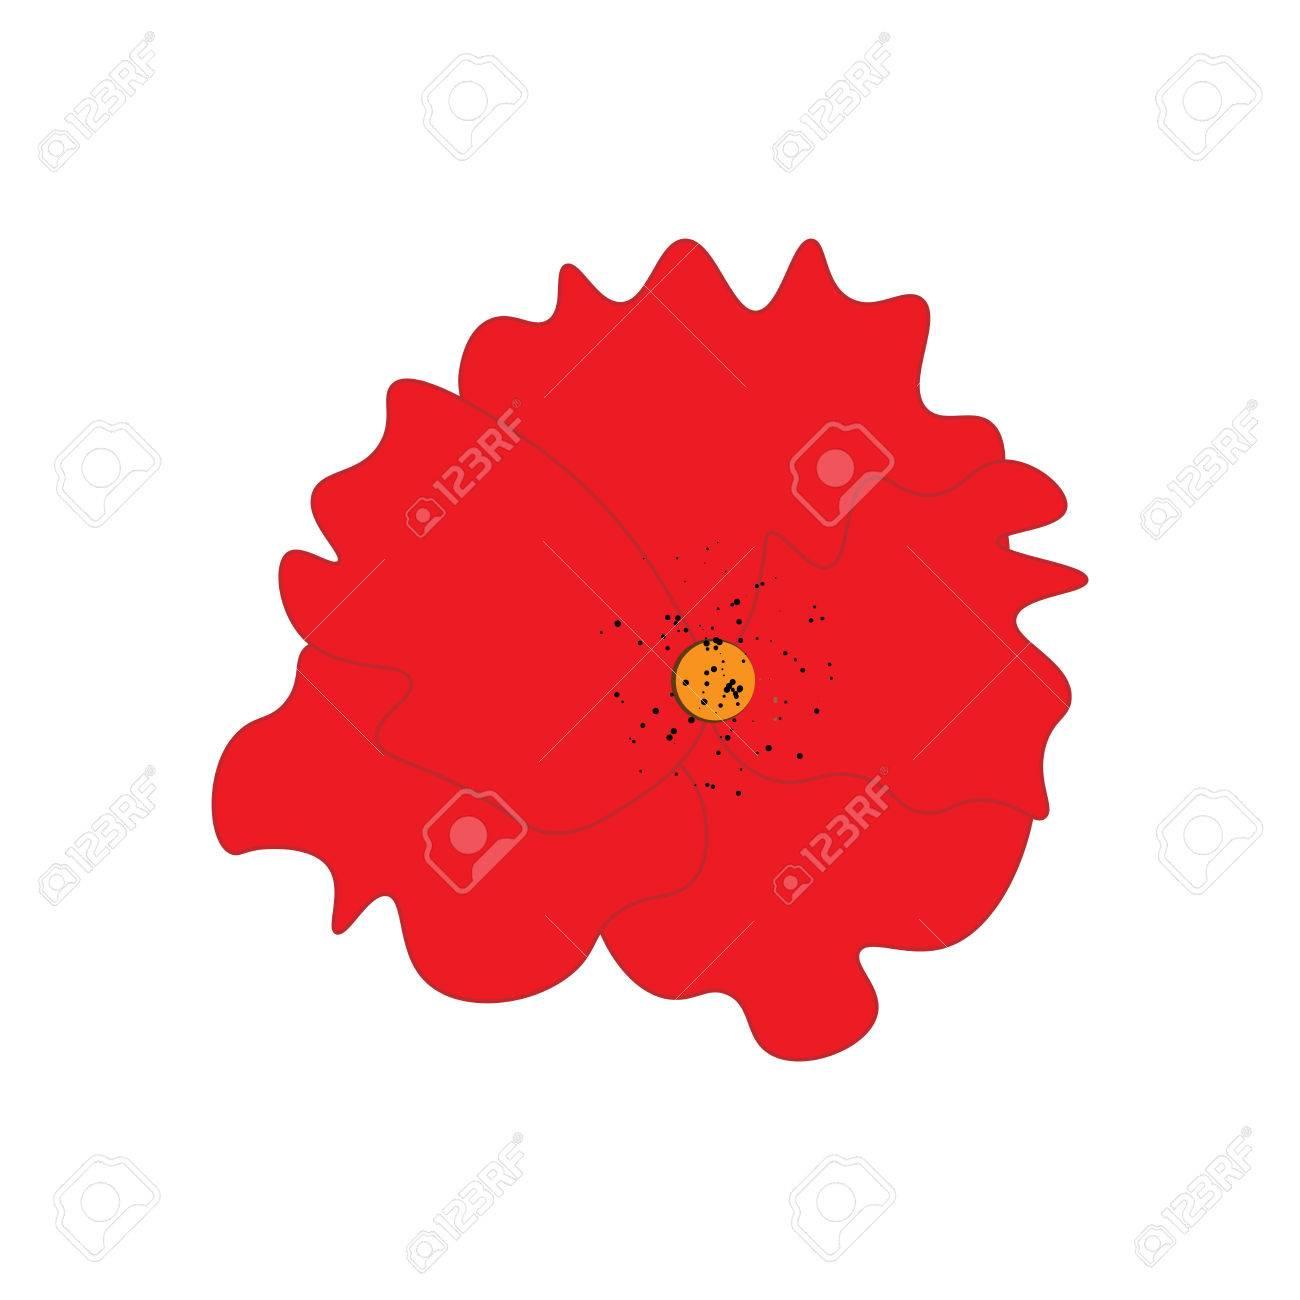 Red poppy flower sign pattern on white background fashion design red poppy flower sign pattern on white background fashion design modern spring summer mightylinksfo